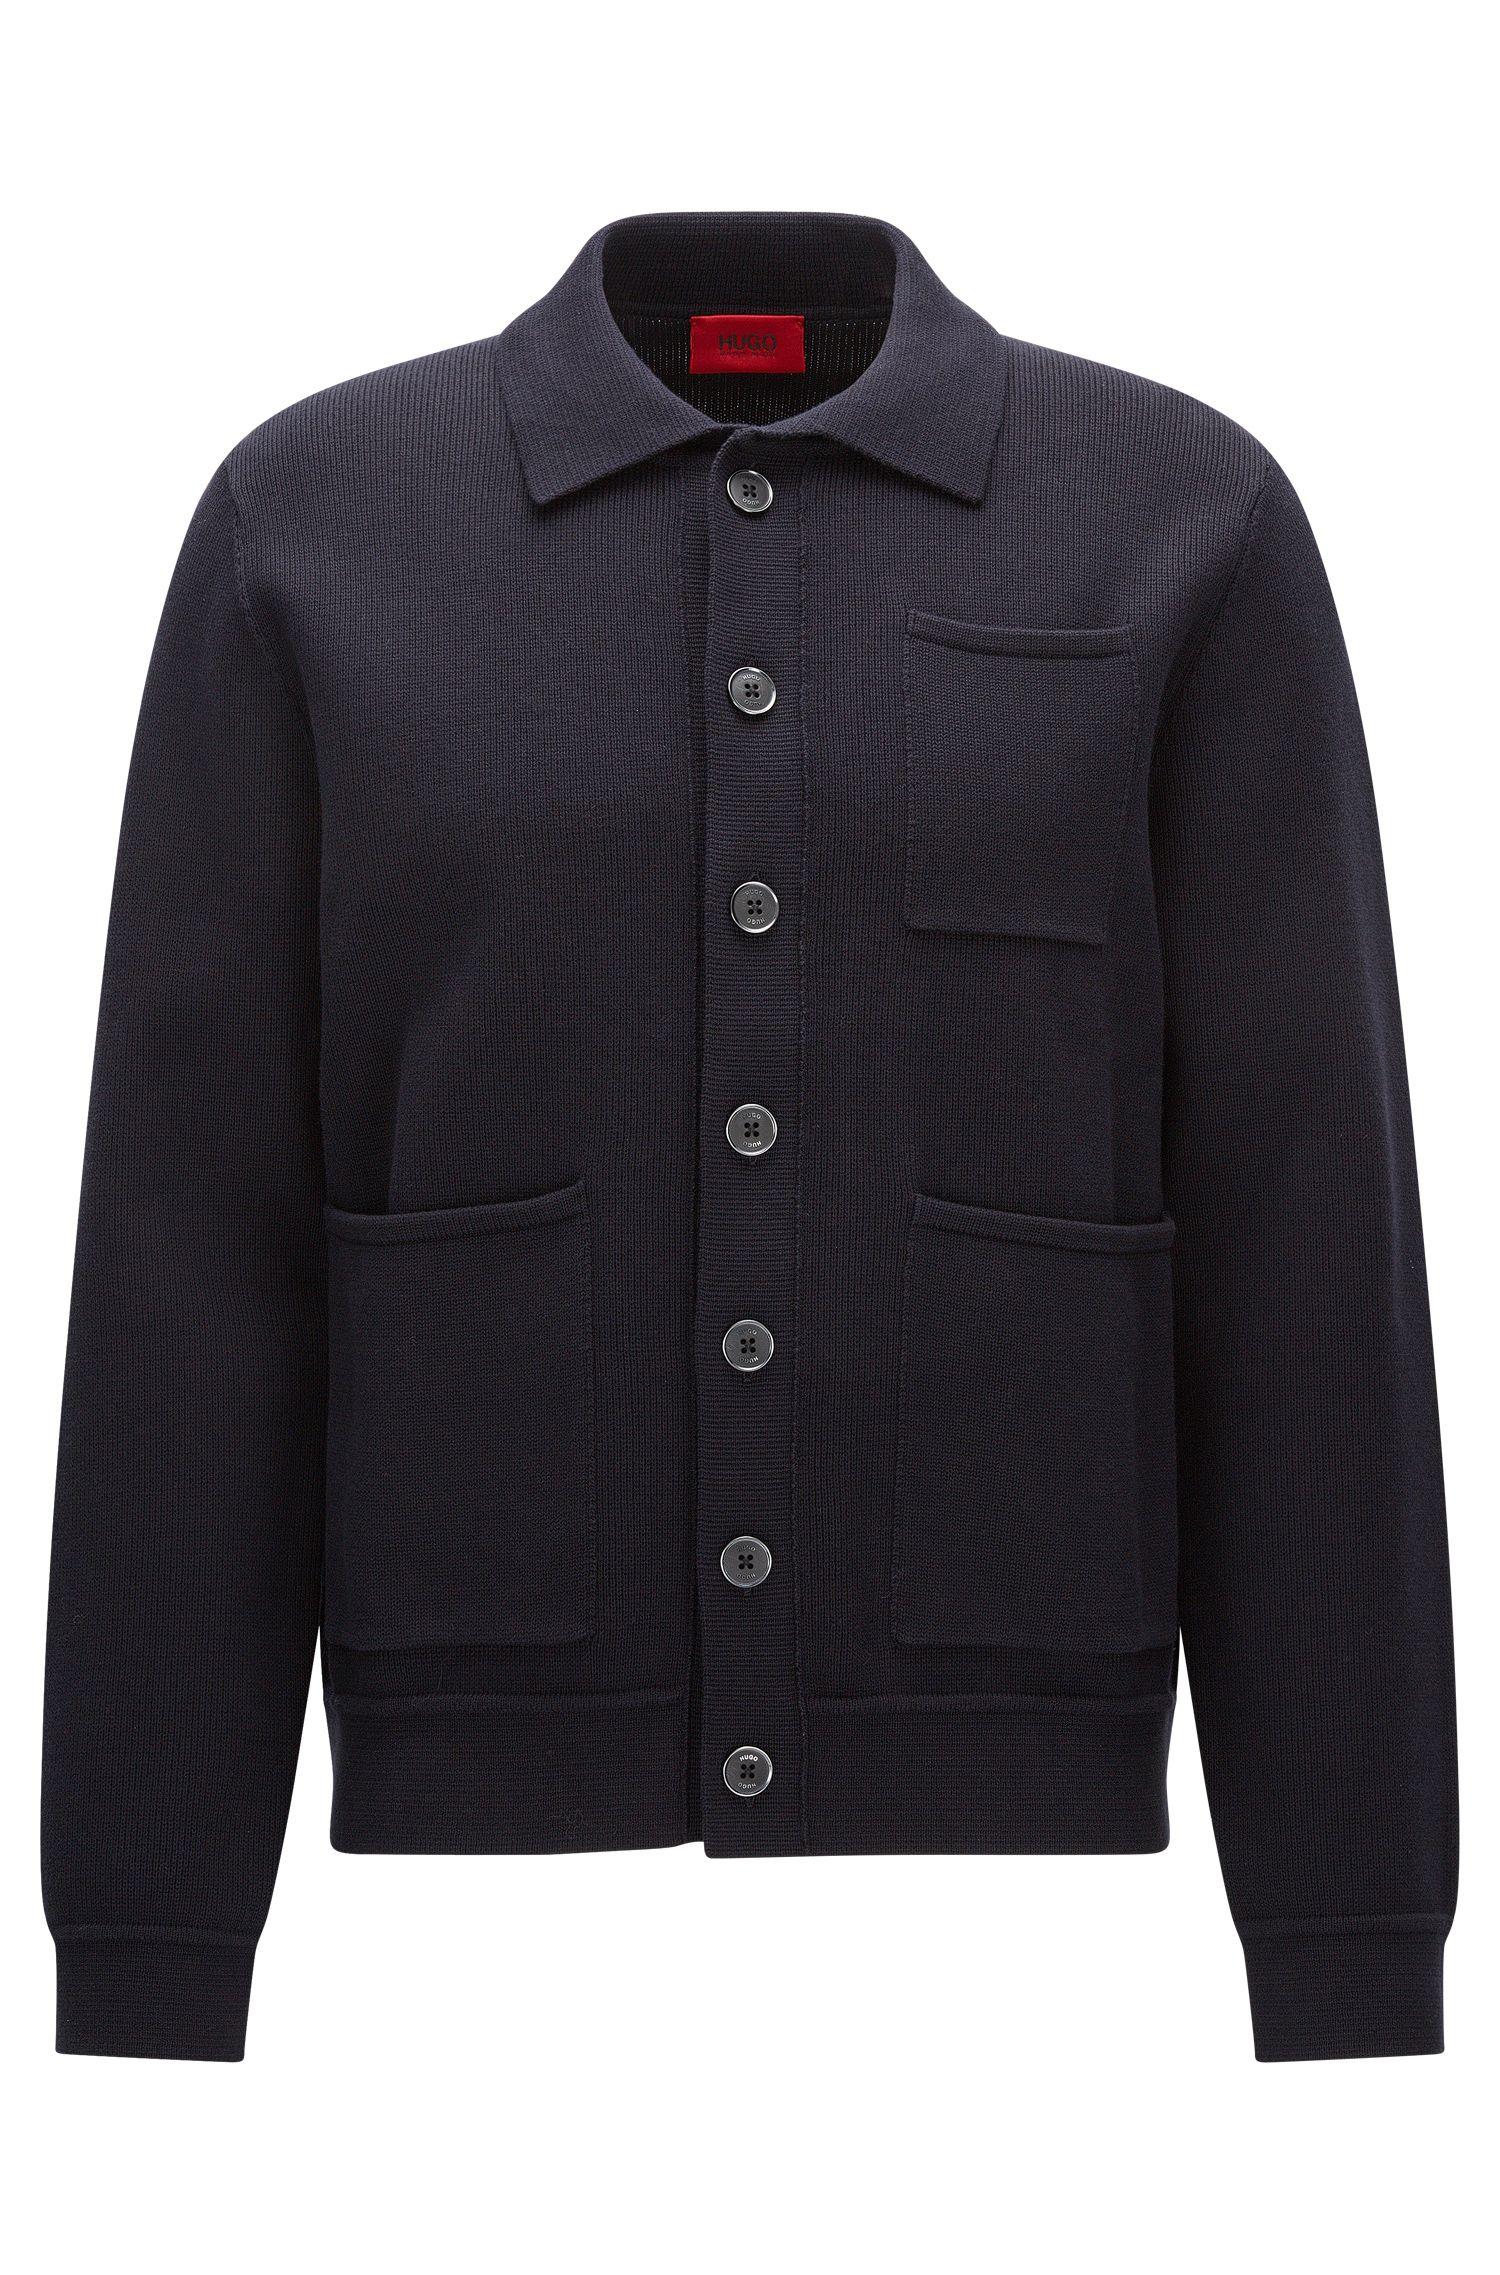 Oversize Jacke aus fester Baumwolle